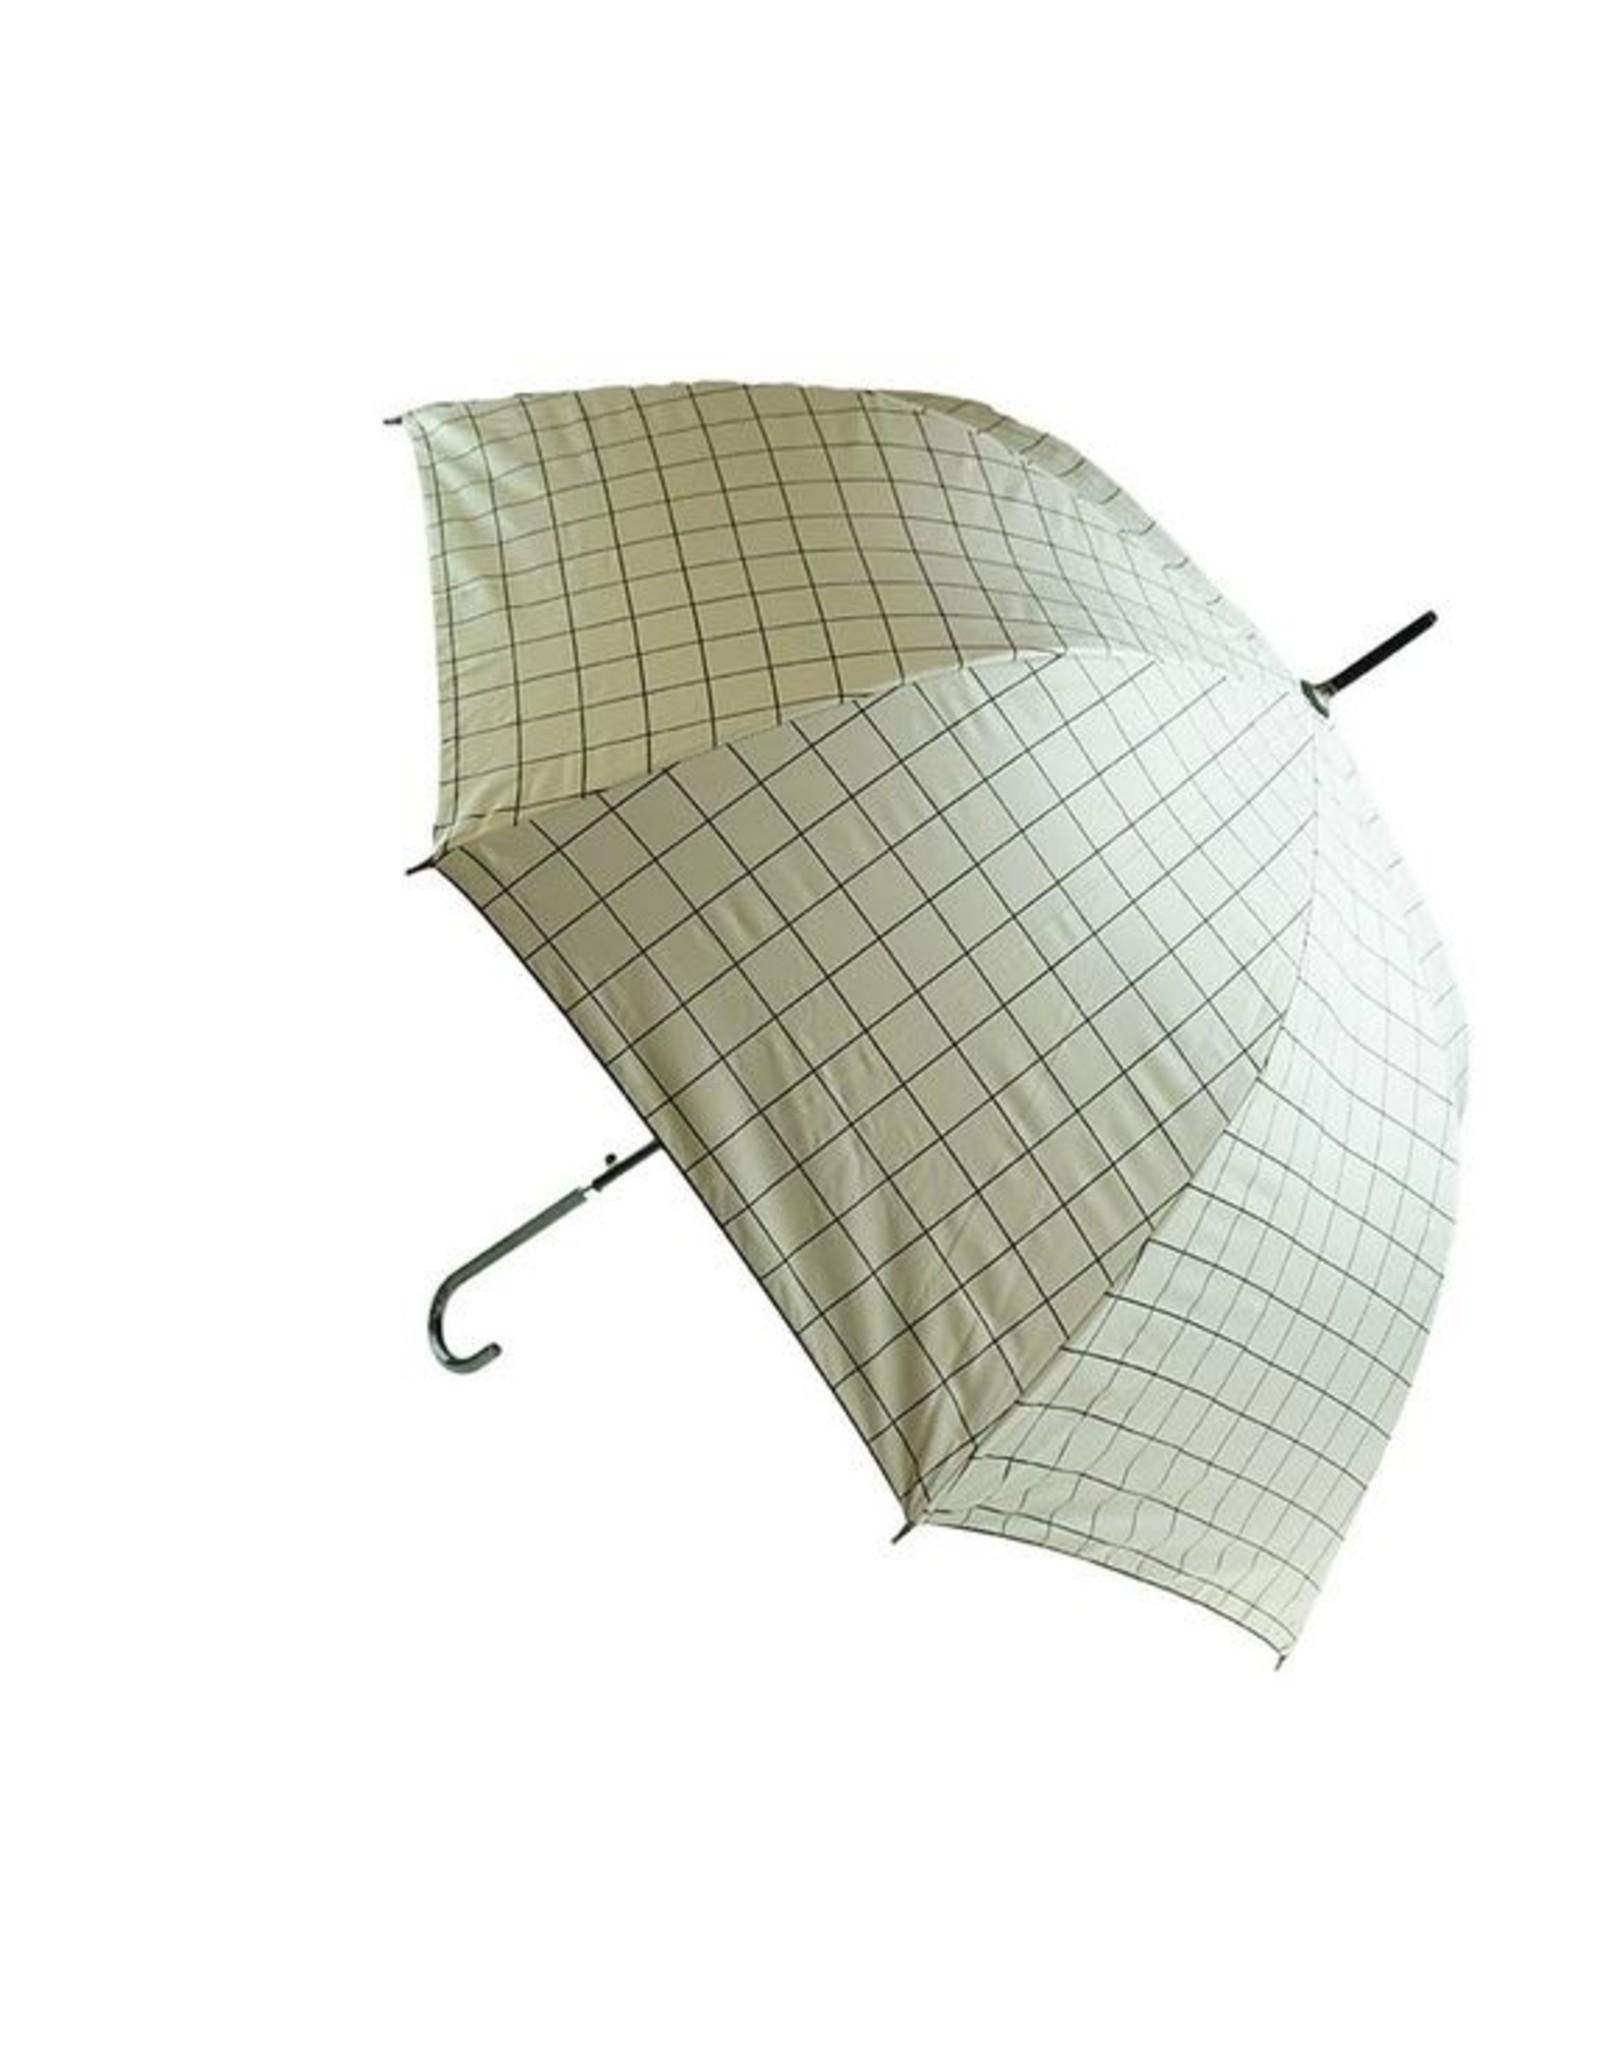 Large Check Mary Poppins Umbrella